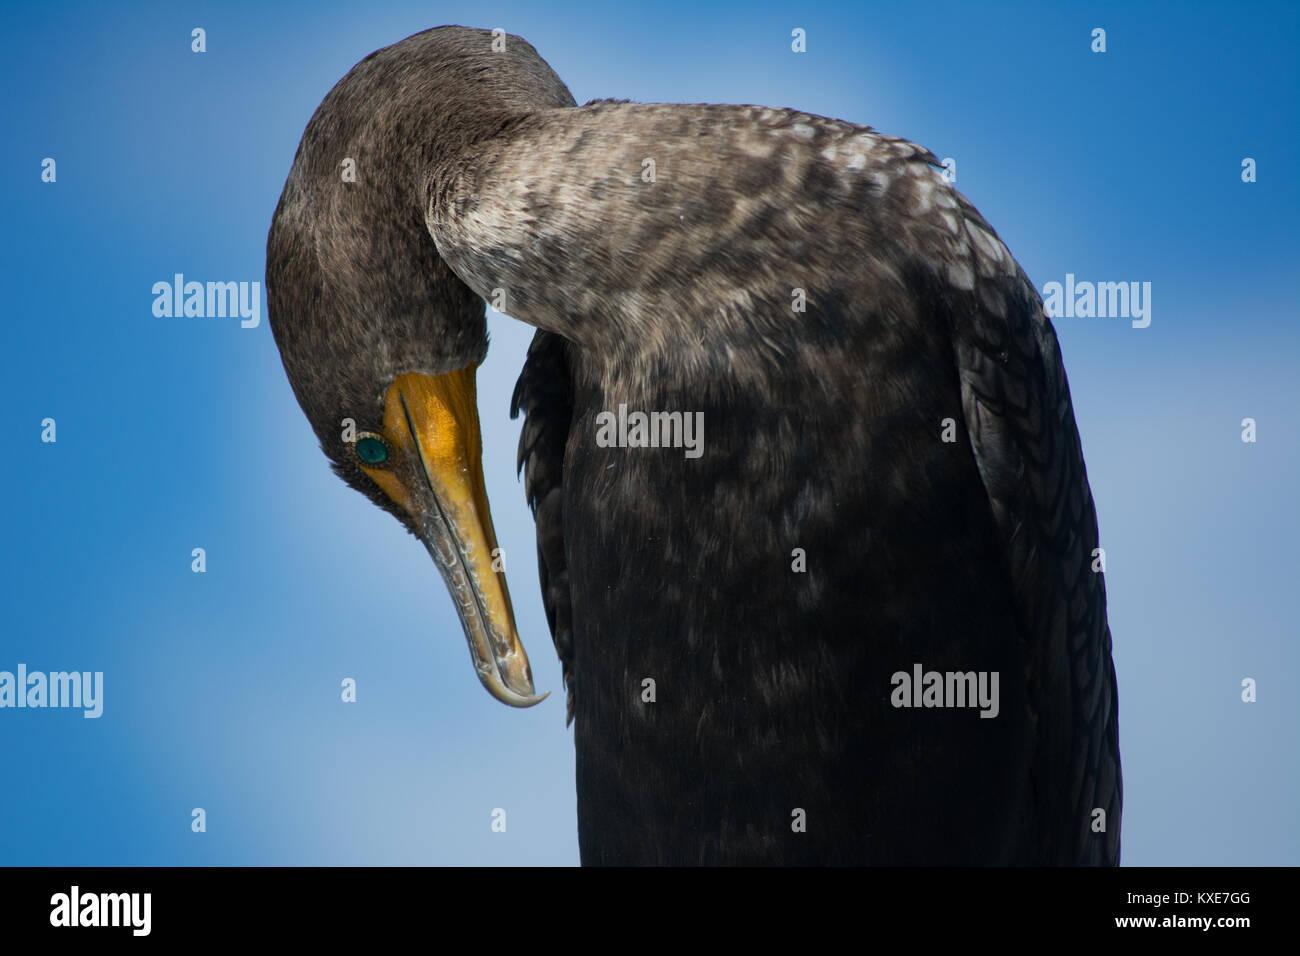 Double-crested Cormorant (Phalacrocorax auritus) from Miami-Dade County, Florida, USA. - Stock Image